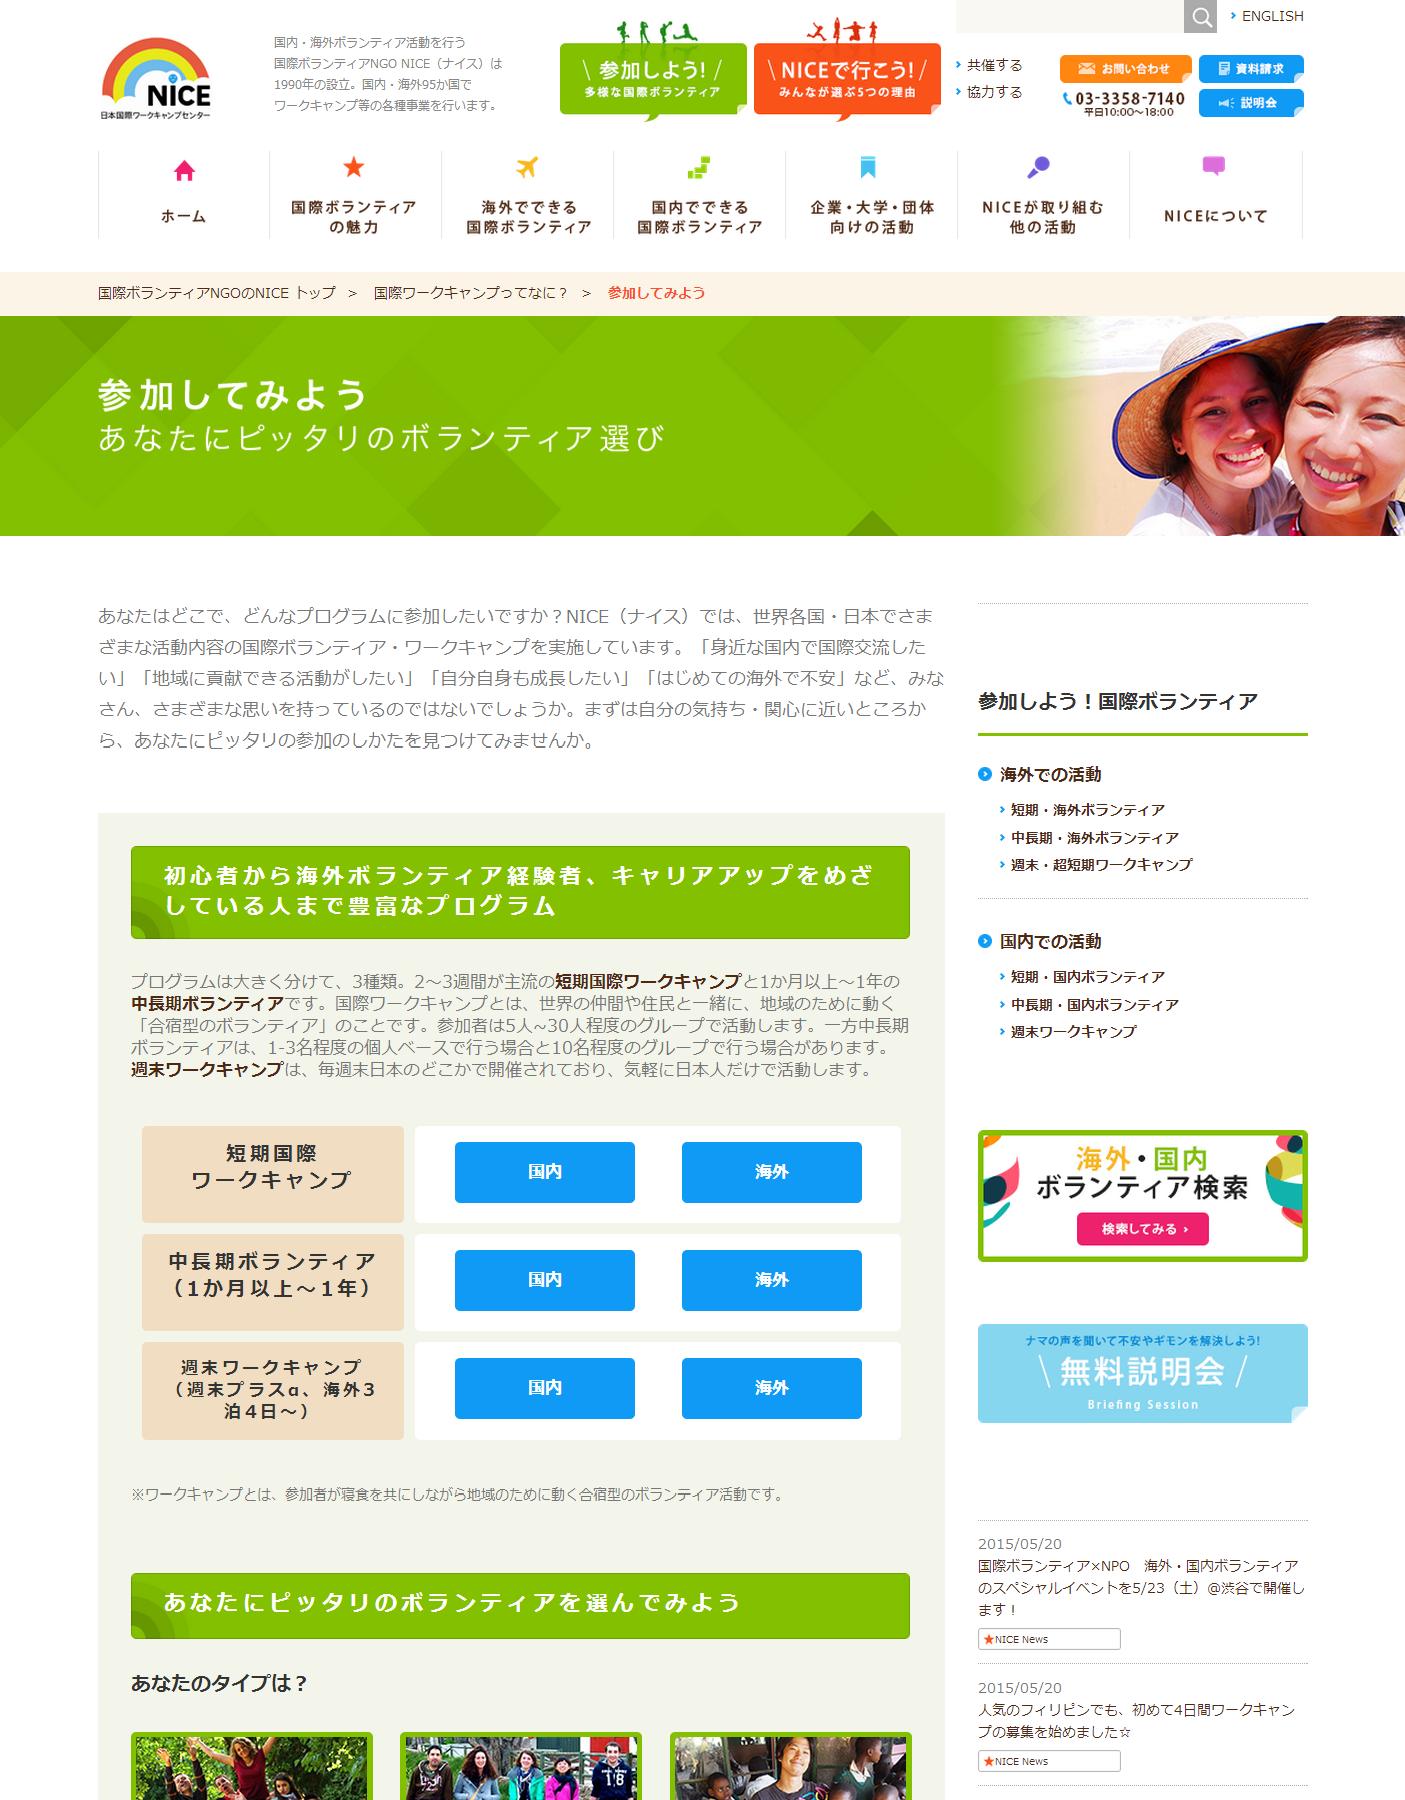 http://www.ark-web.jp/blog/images/nice02.png